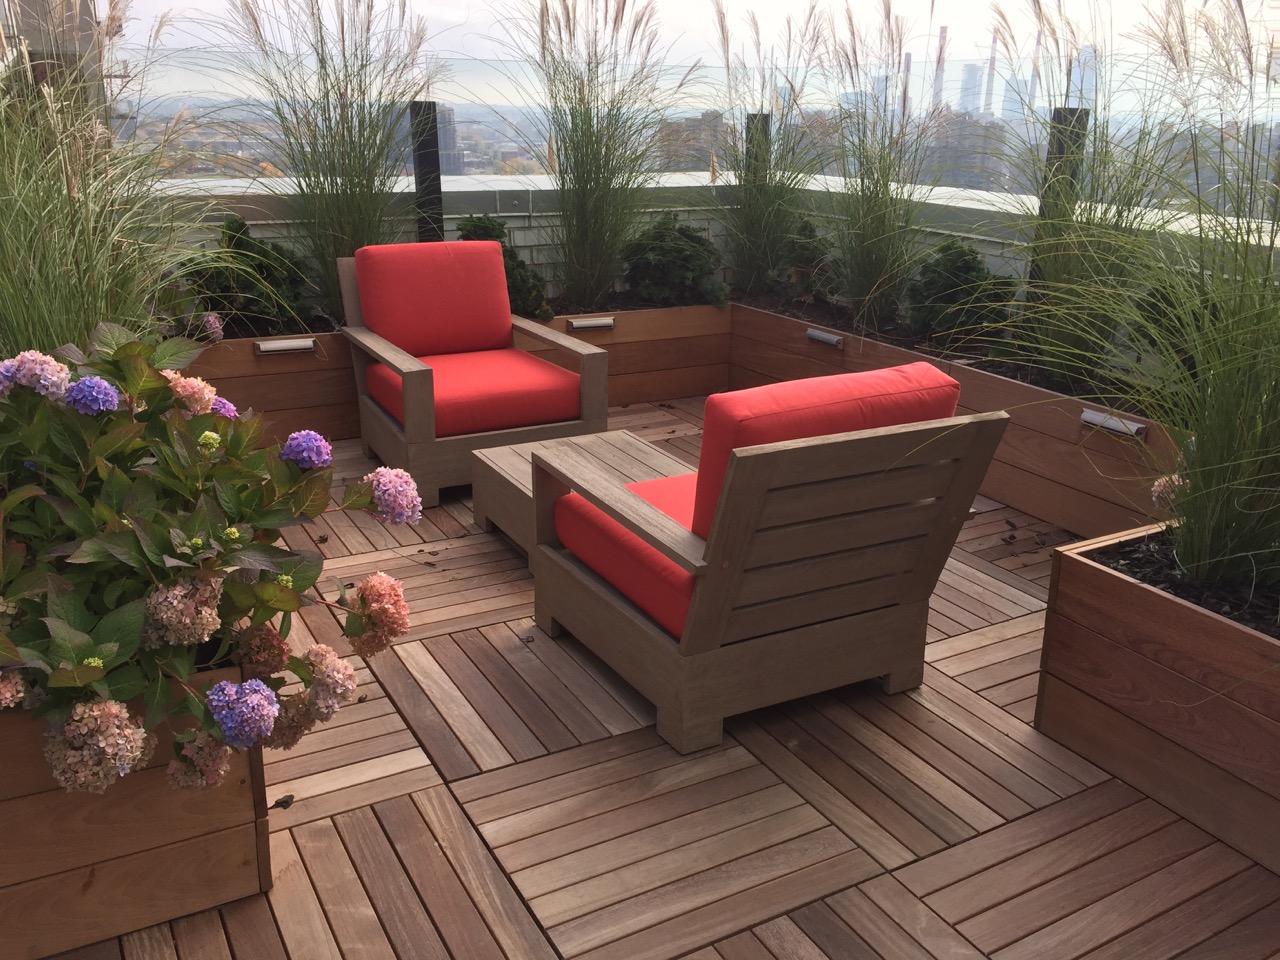 nyc-roof-decks-new-york-decking-8